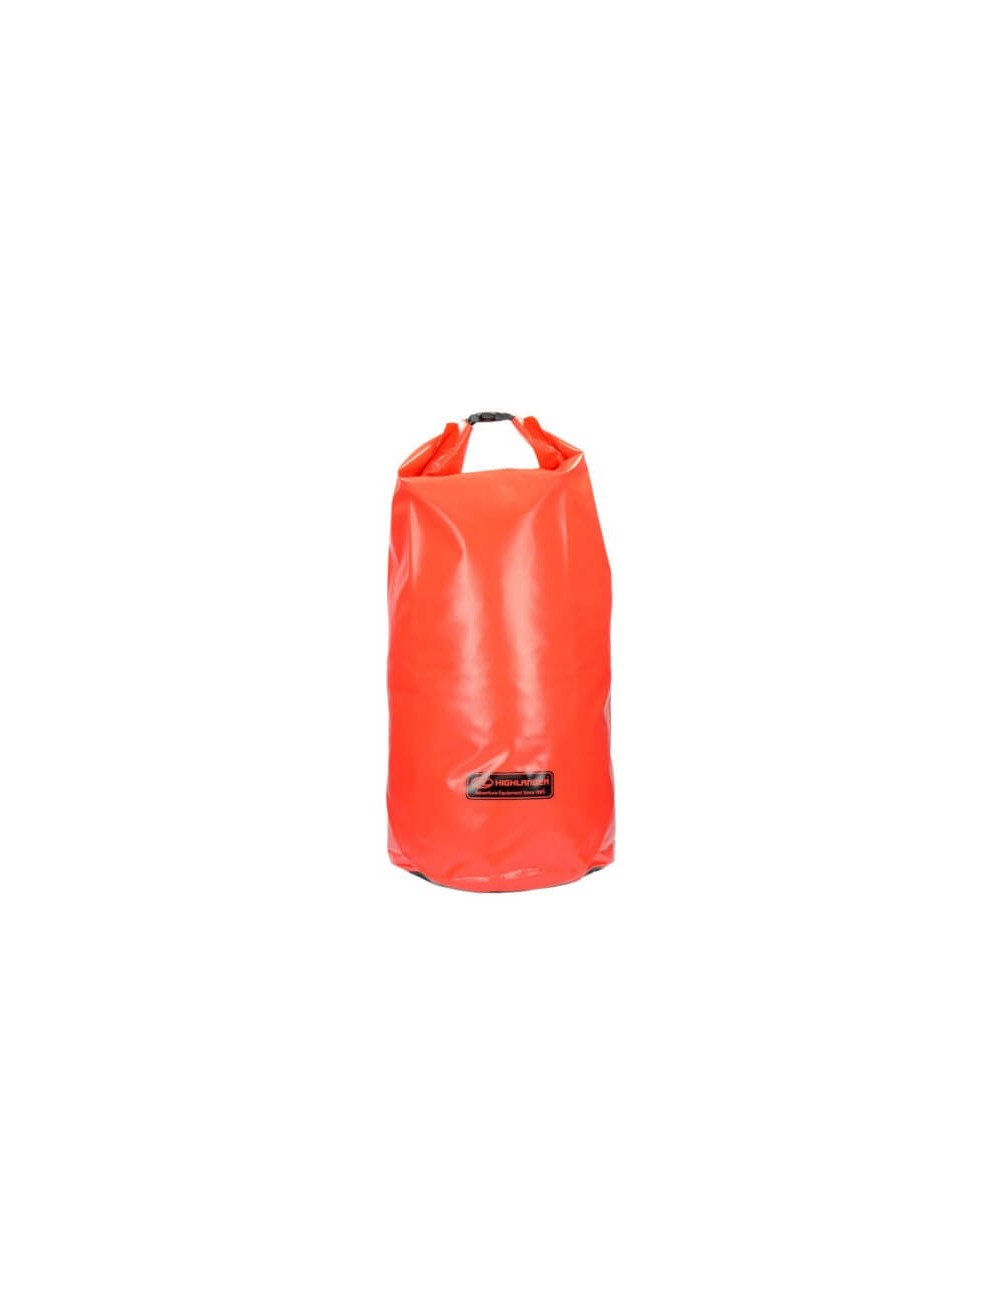 Highlander Tri Laminate PVC Dry Bag (44 litres) - Black